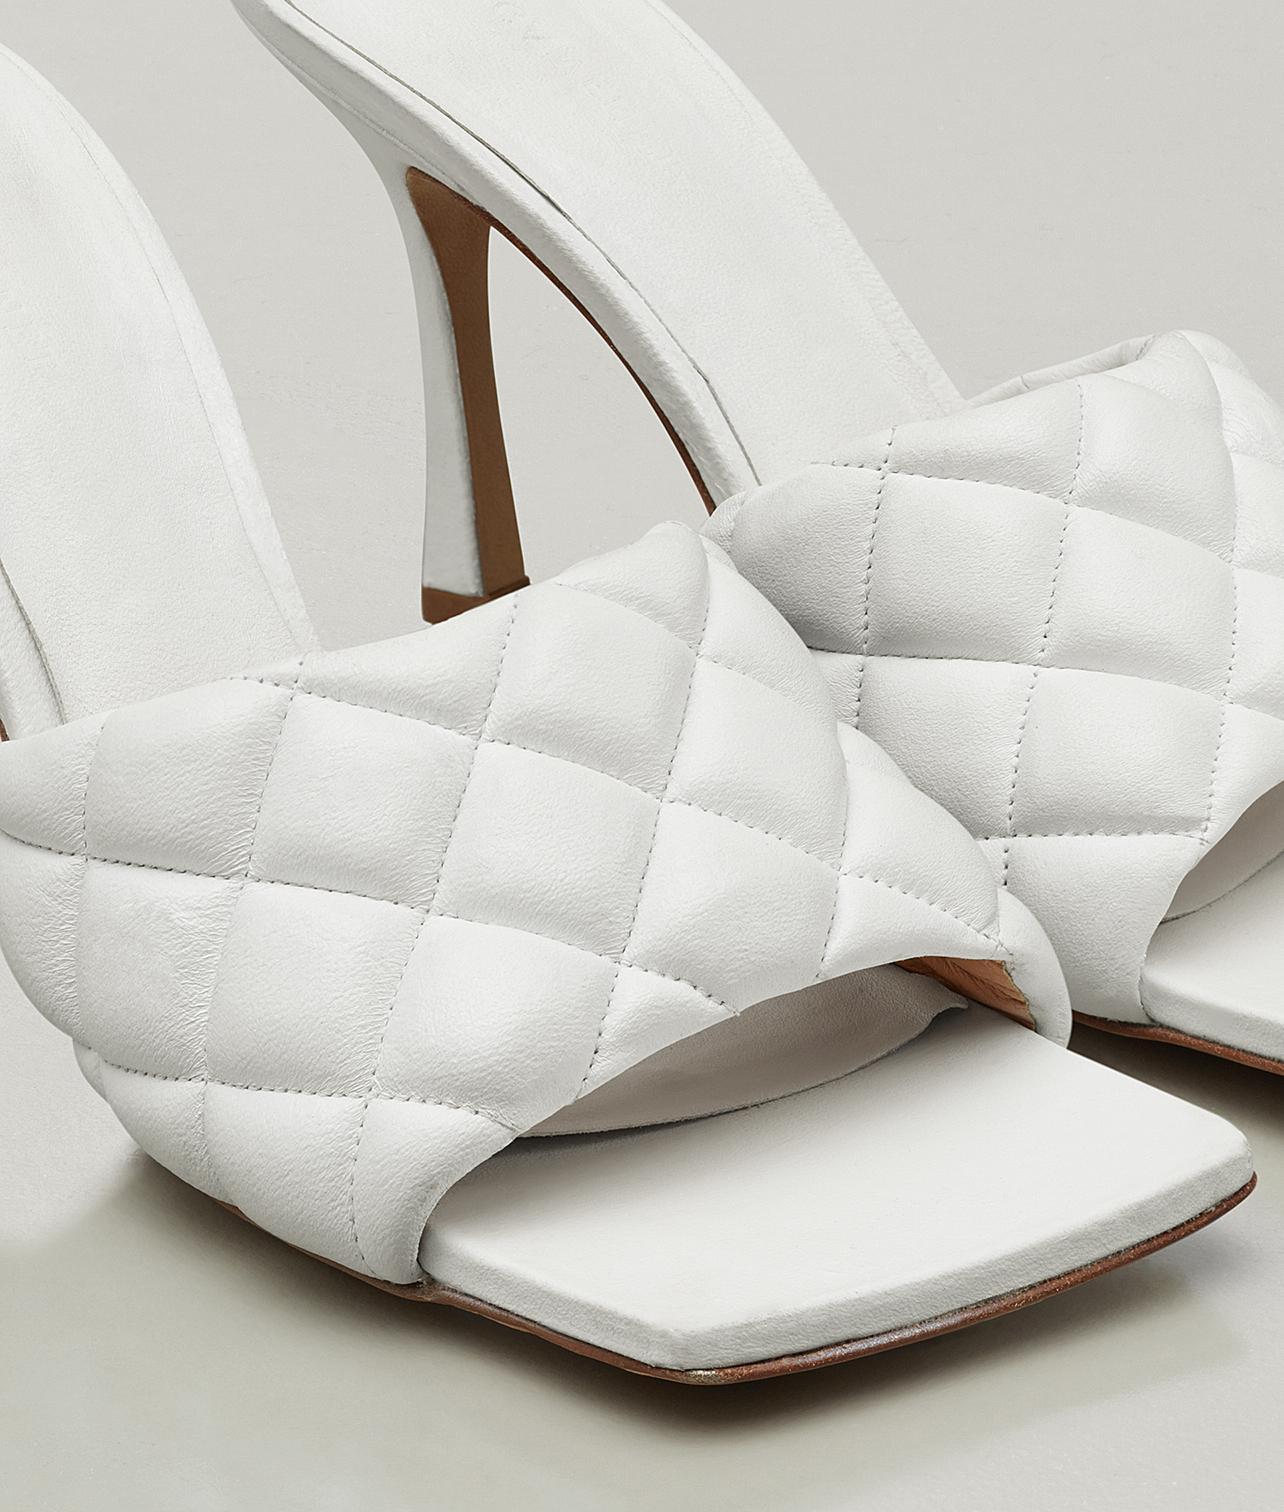 BOTTEGA VENETA   Sandals   SANDALS   Bv Board Leather